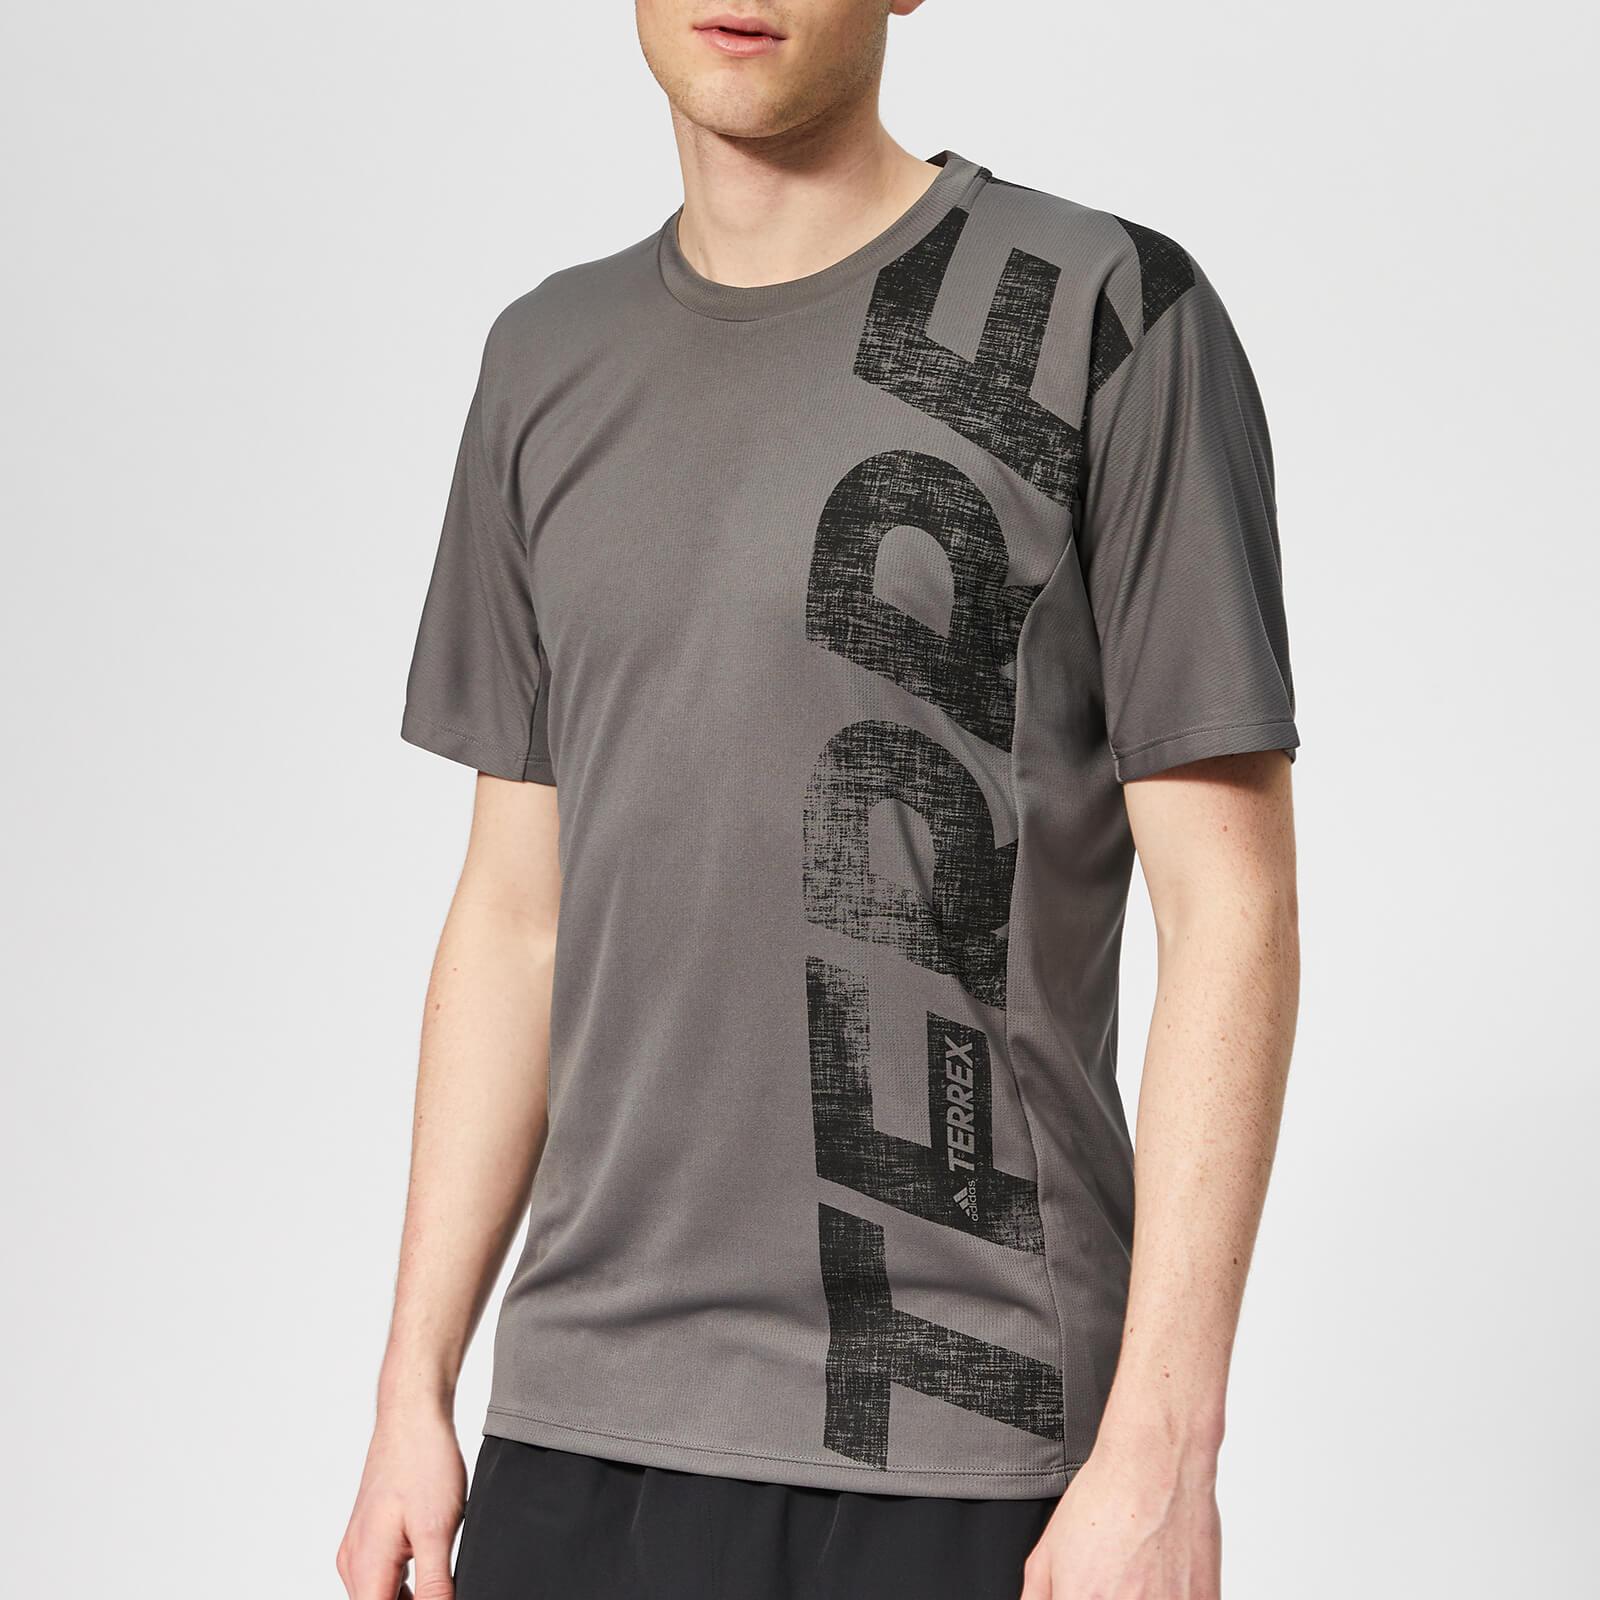 adidas Men's Terrex Trail Cross Short Sleeve T-Shirt - Grey Five - 42/44 Inch (Chest Size) - Grey